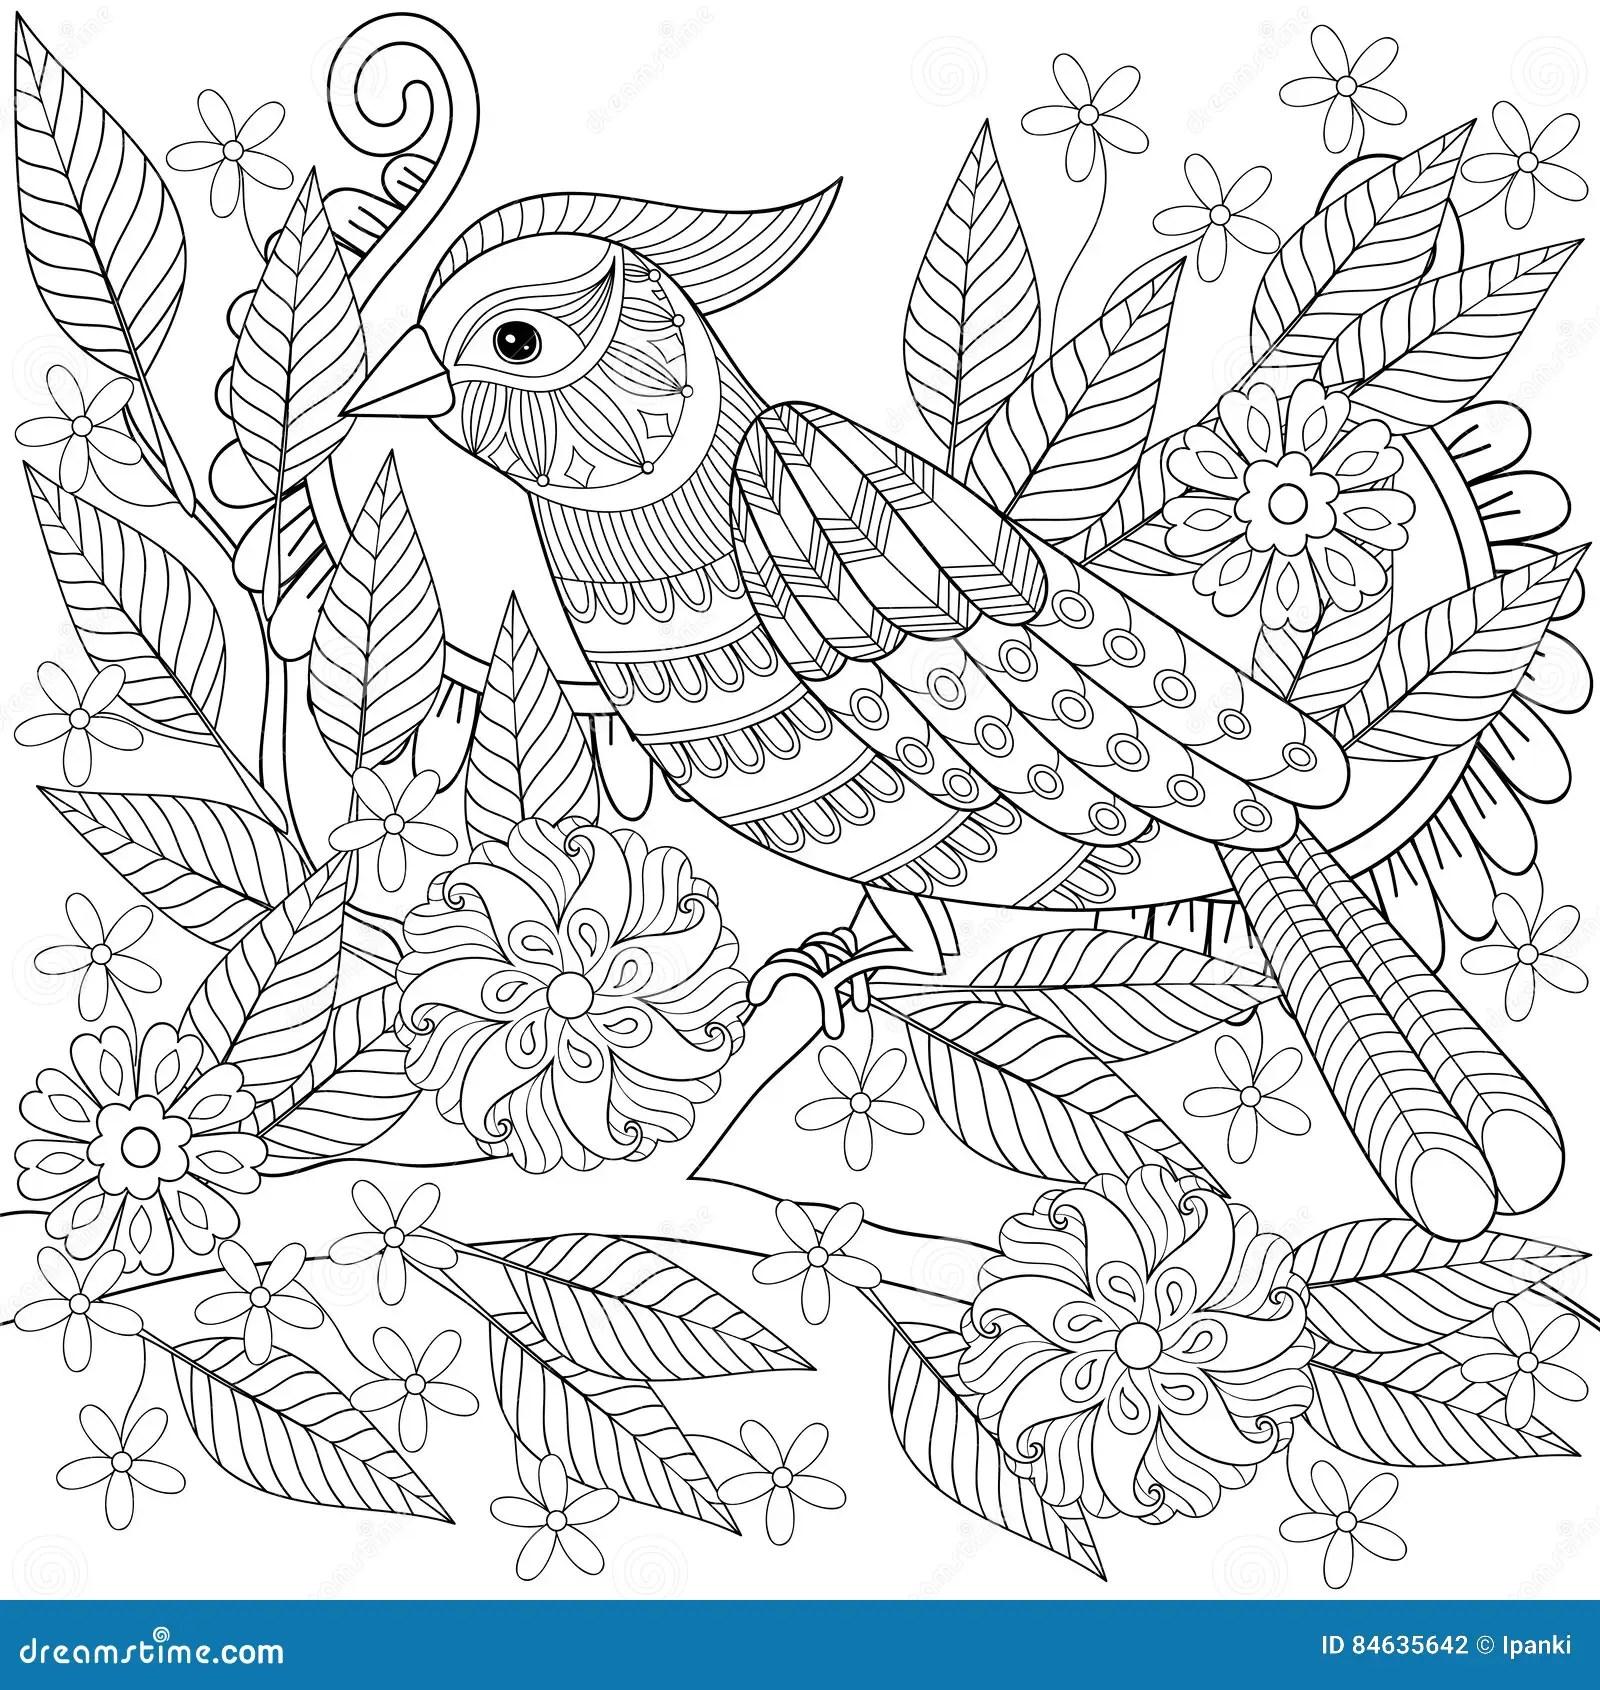 Hand Drawn Zentangle Bird Sitting On Blooming Tree Branch